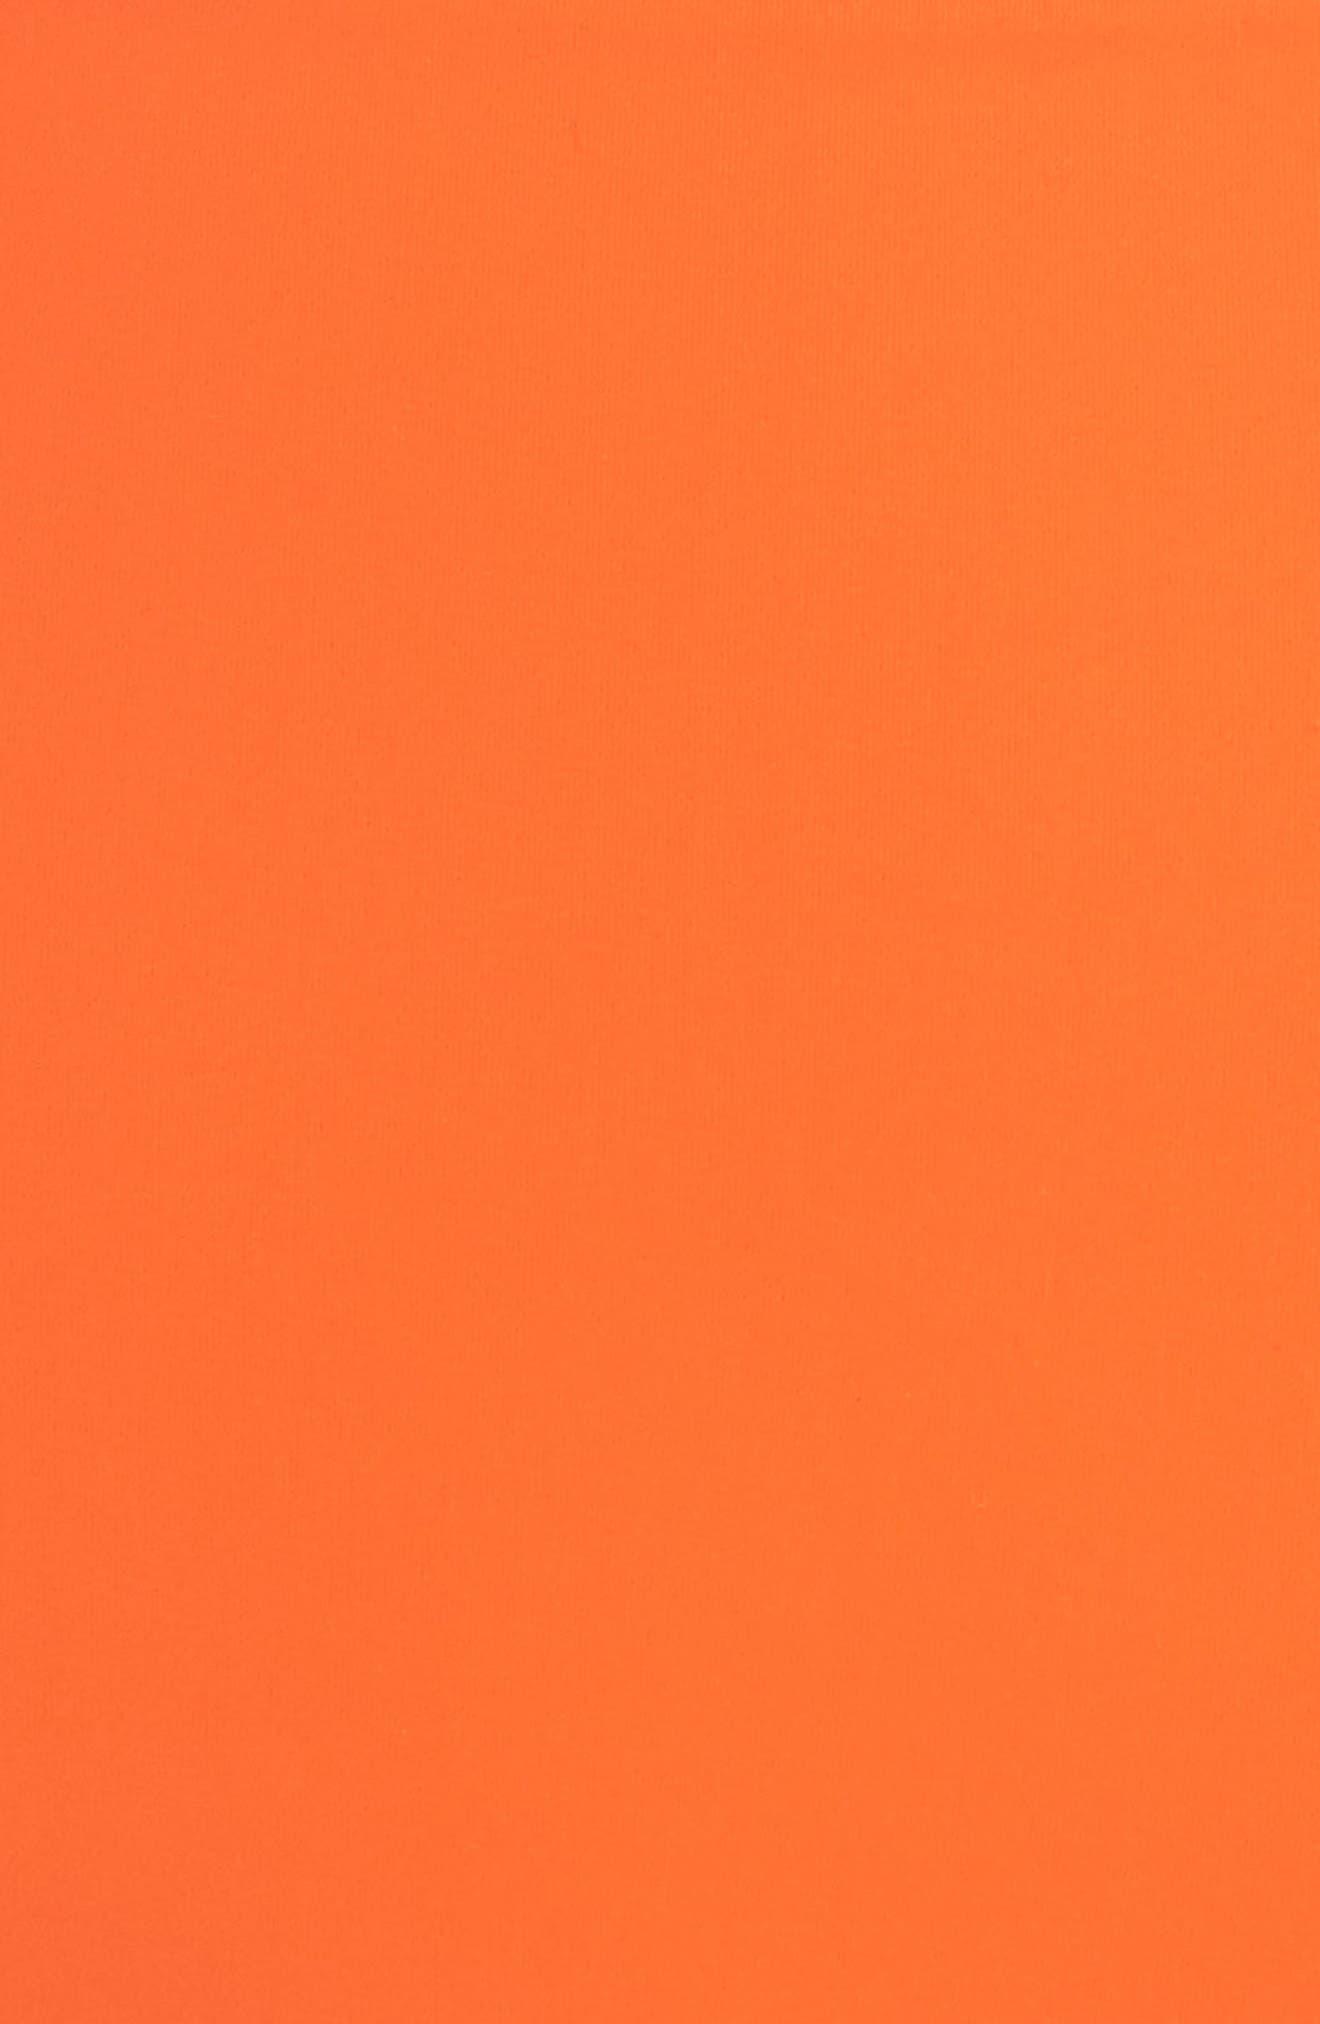 Marina High Waist Bikini Bottoms,                             Alternate thumbnail 6, color,                             Sweet Tangerine